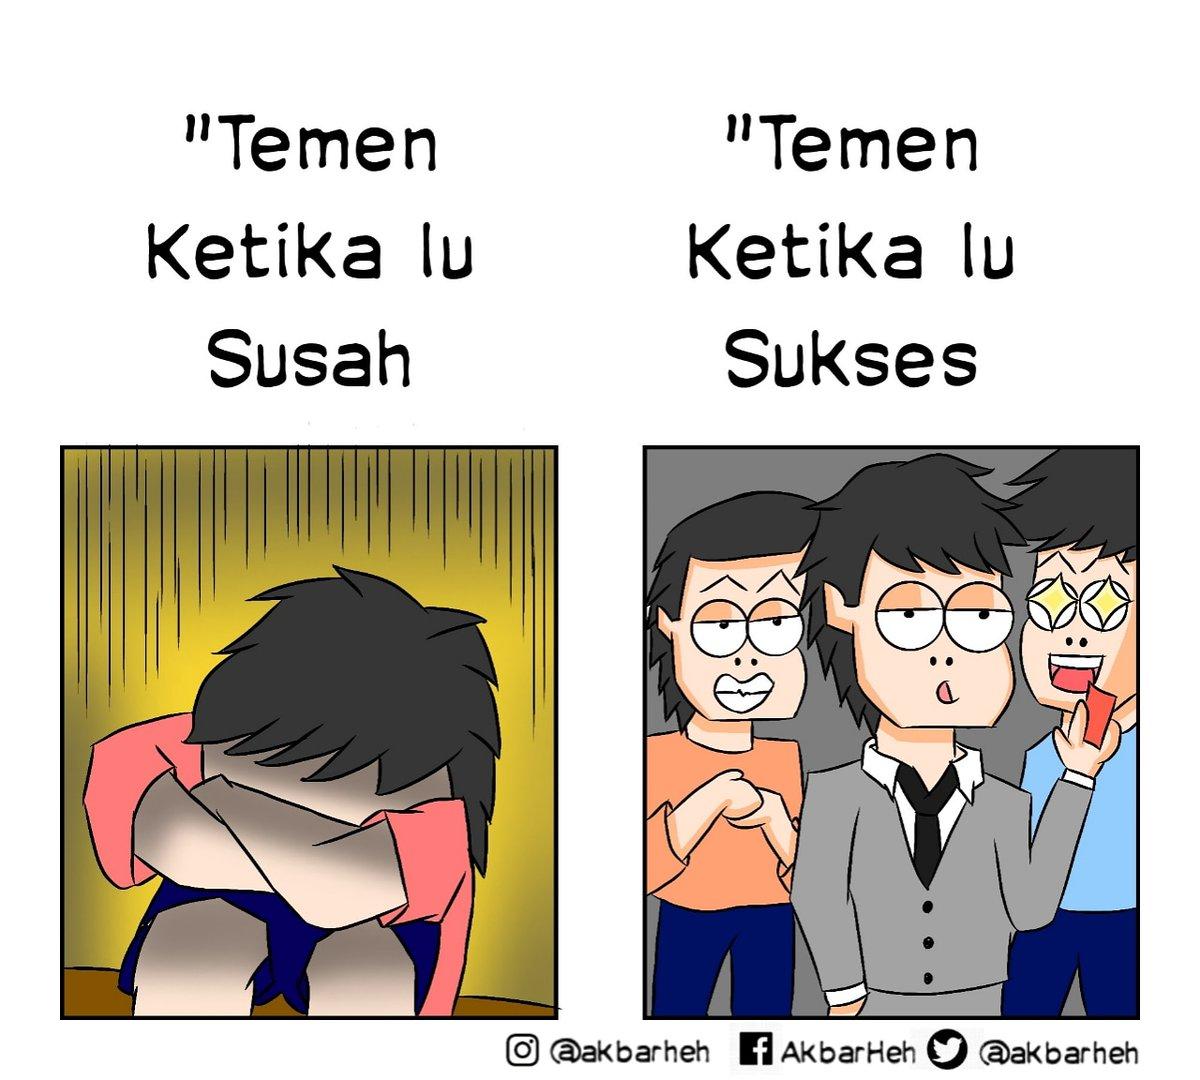 Di ajak susah mana mau .  Jangan lupa follow @akbarheh . . . #komikinaja #komikindo #komikindonesia #idntoon #komiklucu #komikharian #komikngakak #ngakakkocak #komikviral  #viral #indonesia #komikharian_ #komiksederhana #komikhot #siang  #komikzero #komikpolisi #burunghanpic.twitter.com/W5s9lqYklI